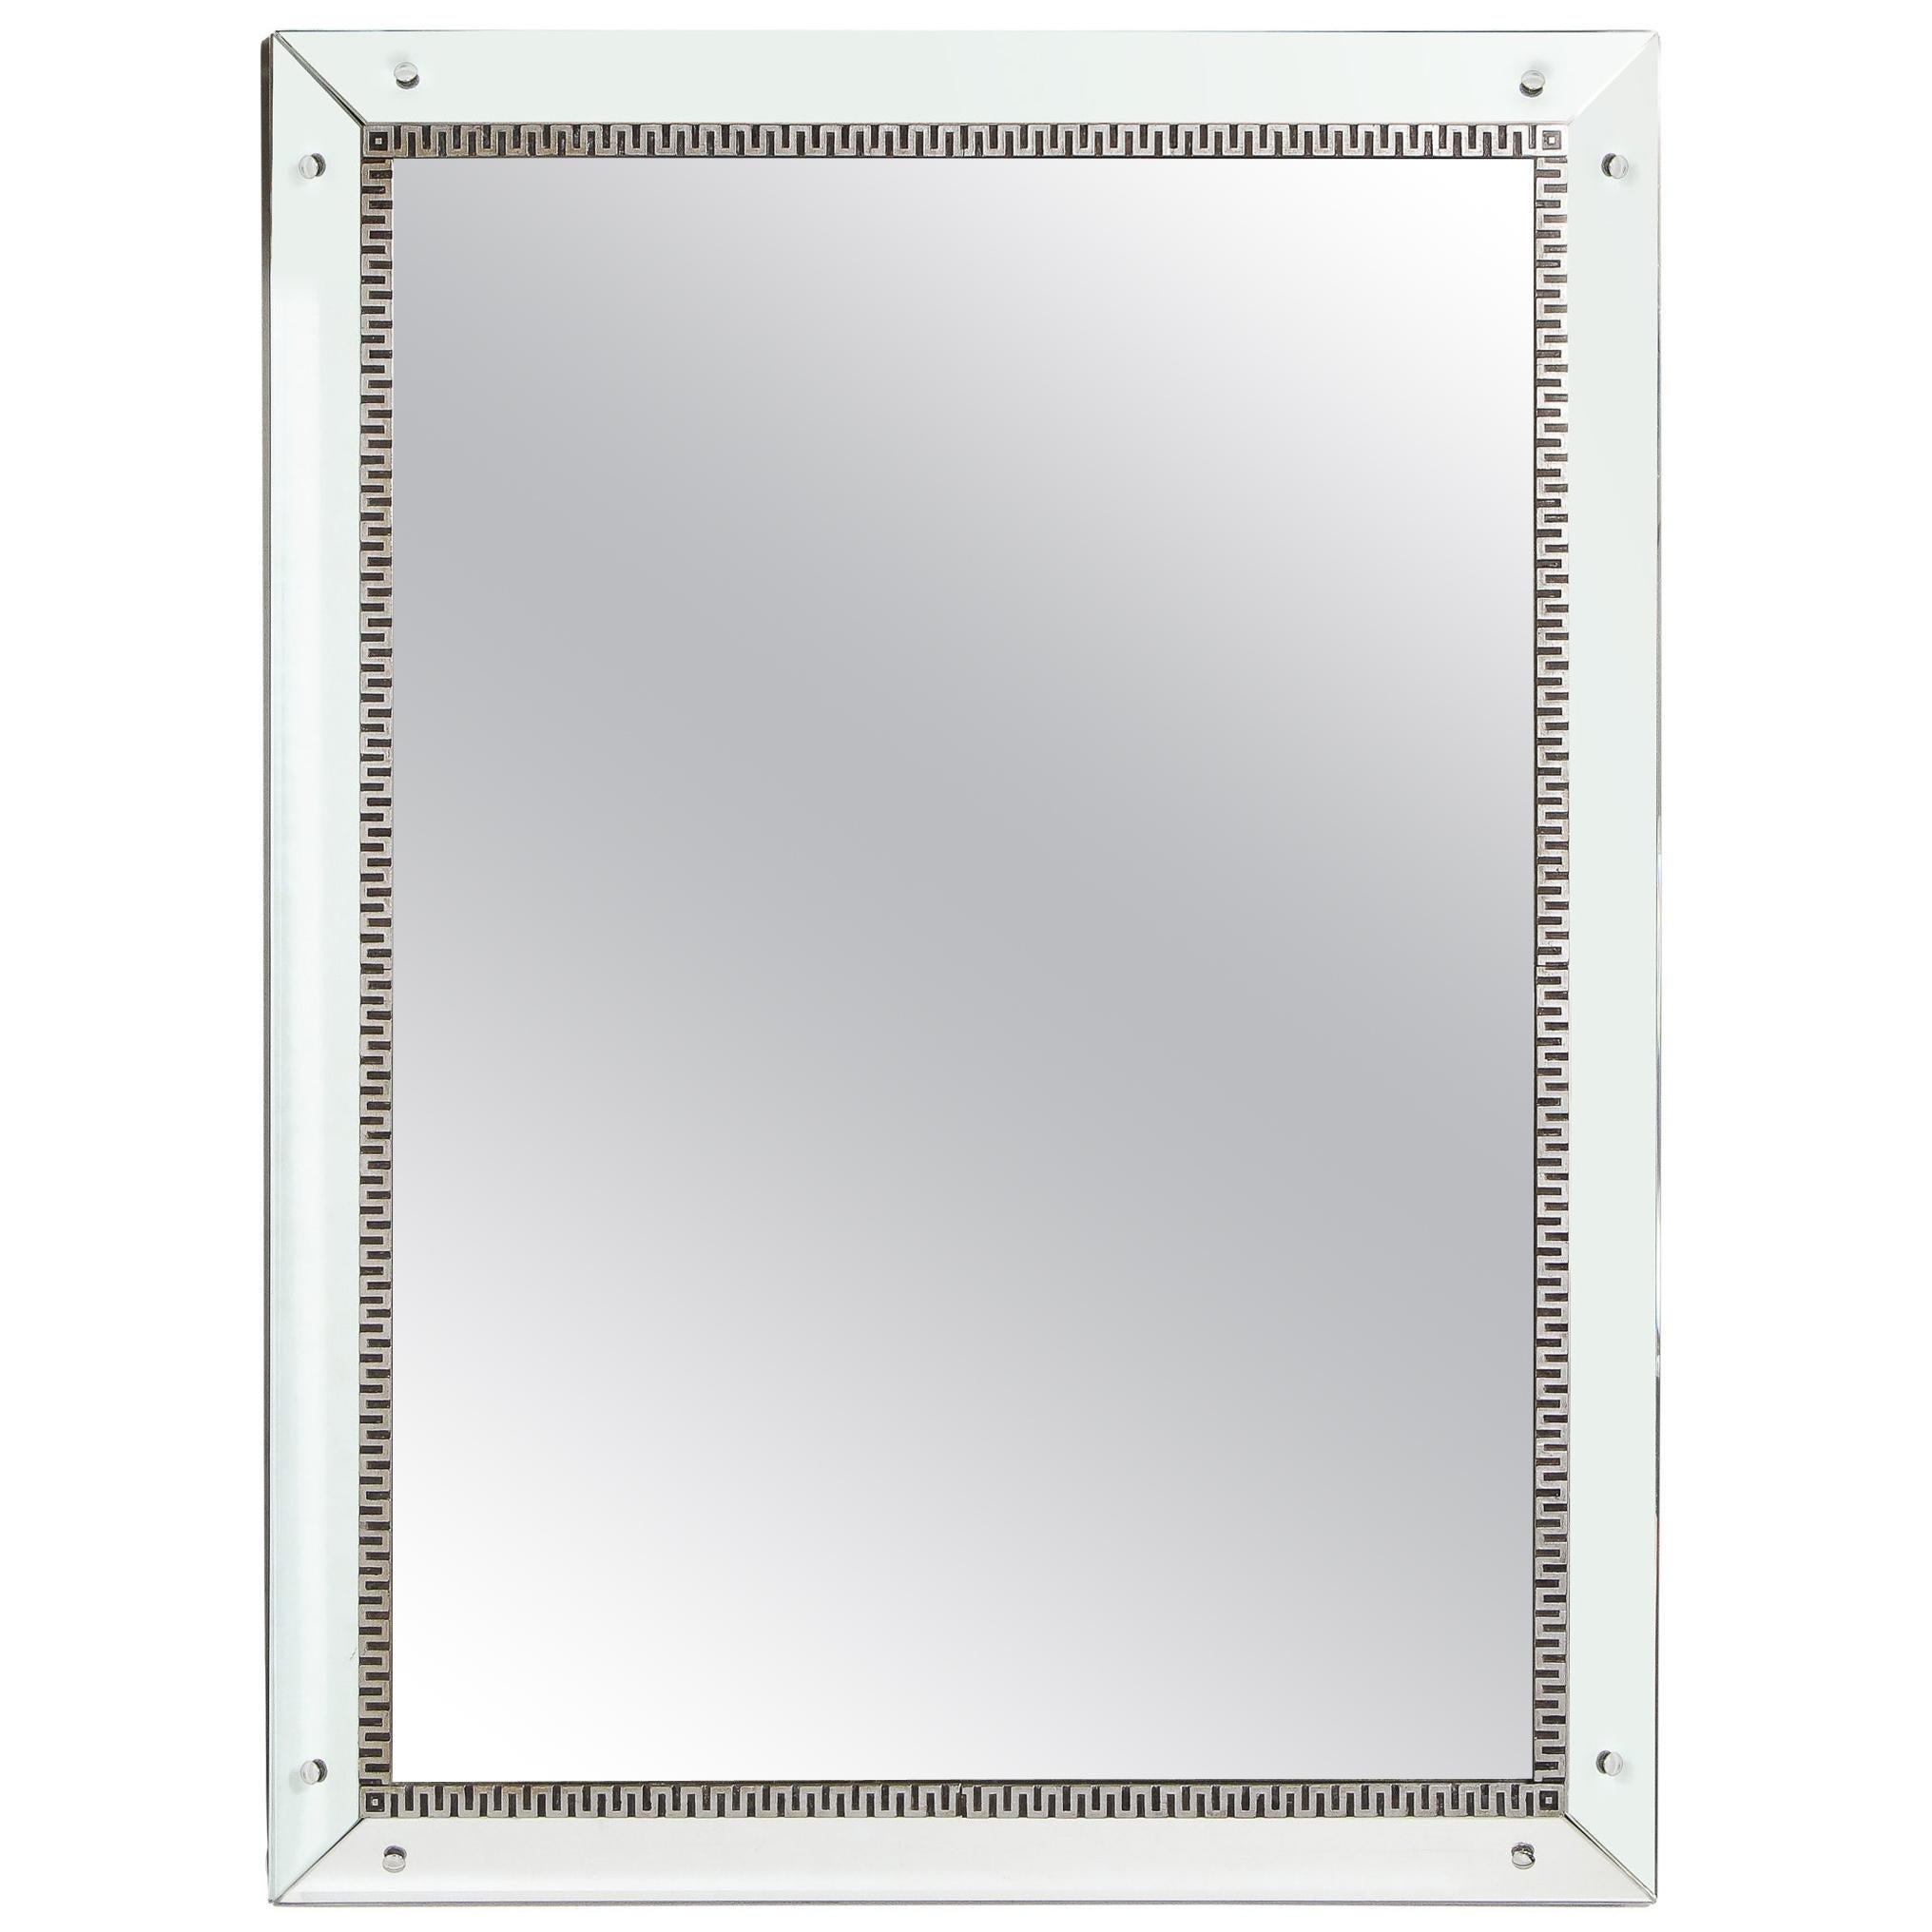 Mid-Century Modern Wall Mirror with Silver Leaf with Stylized Greek Key Motif